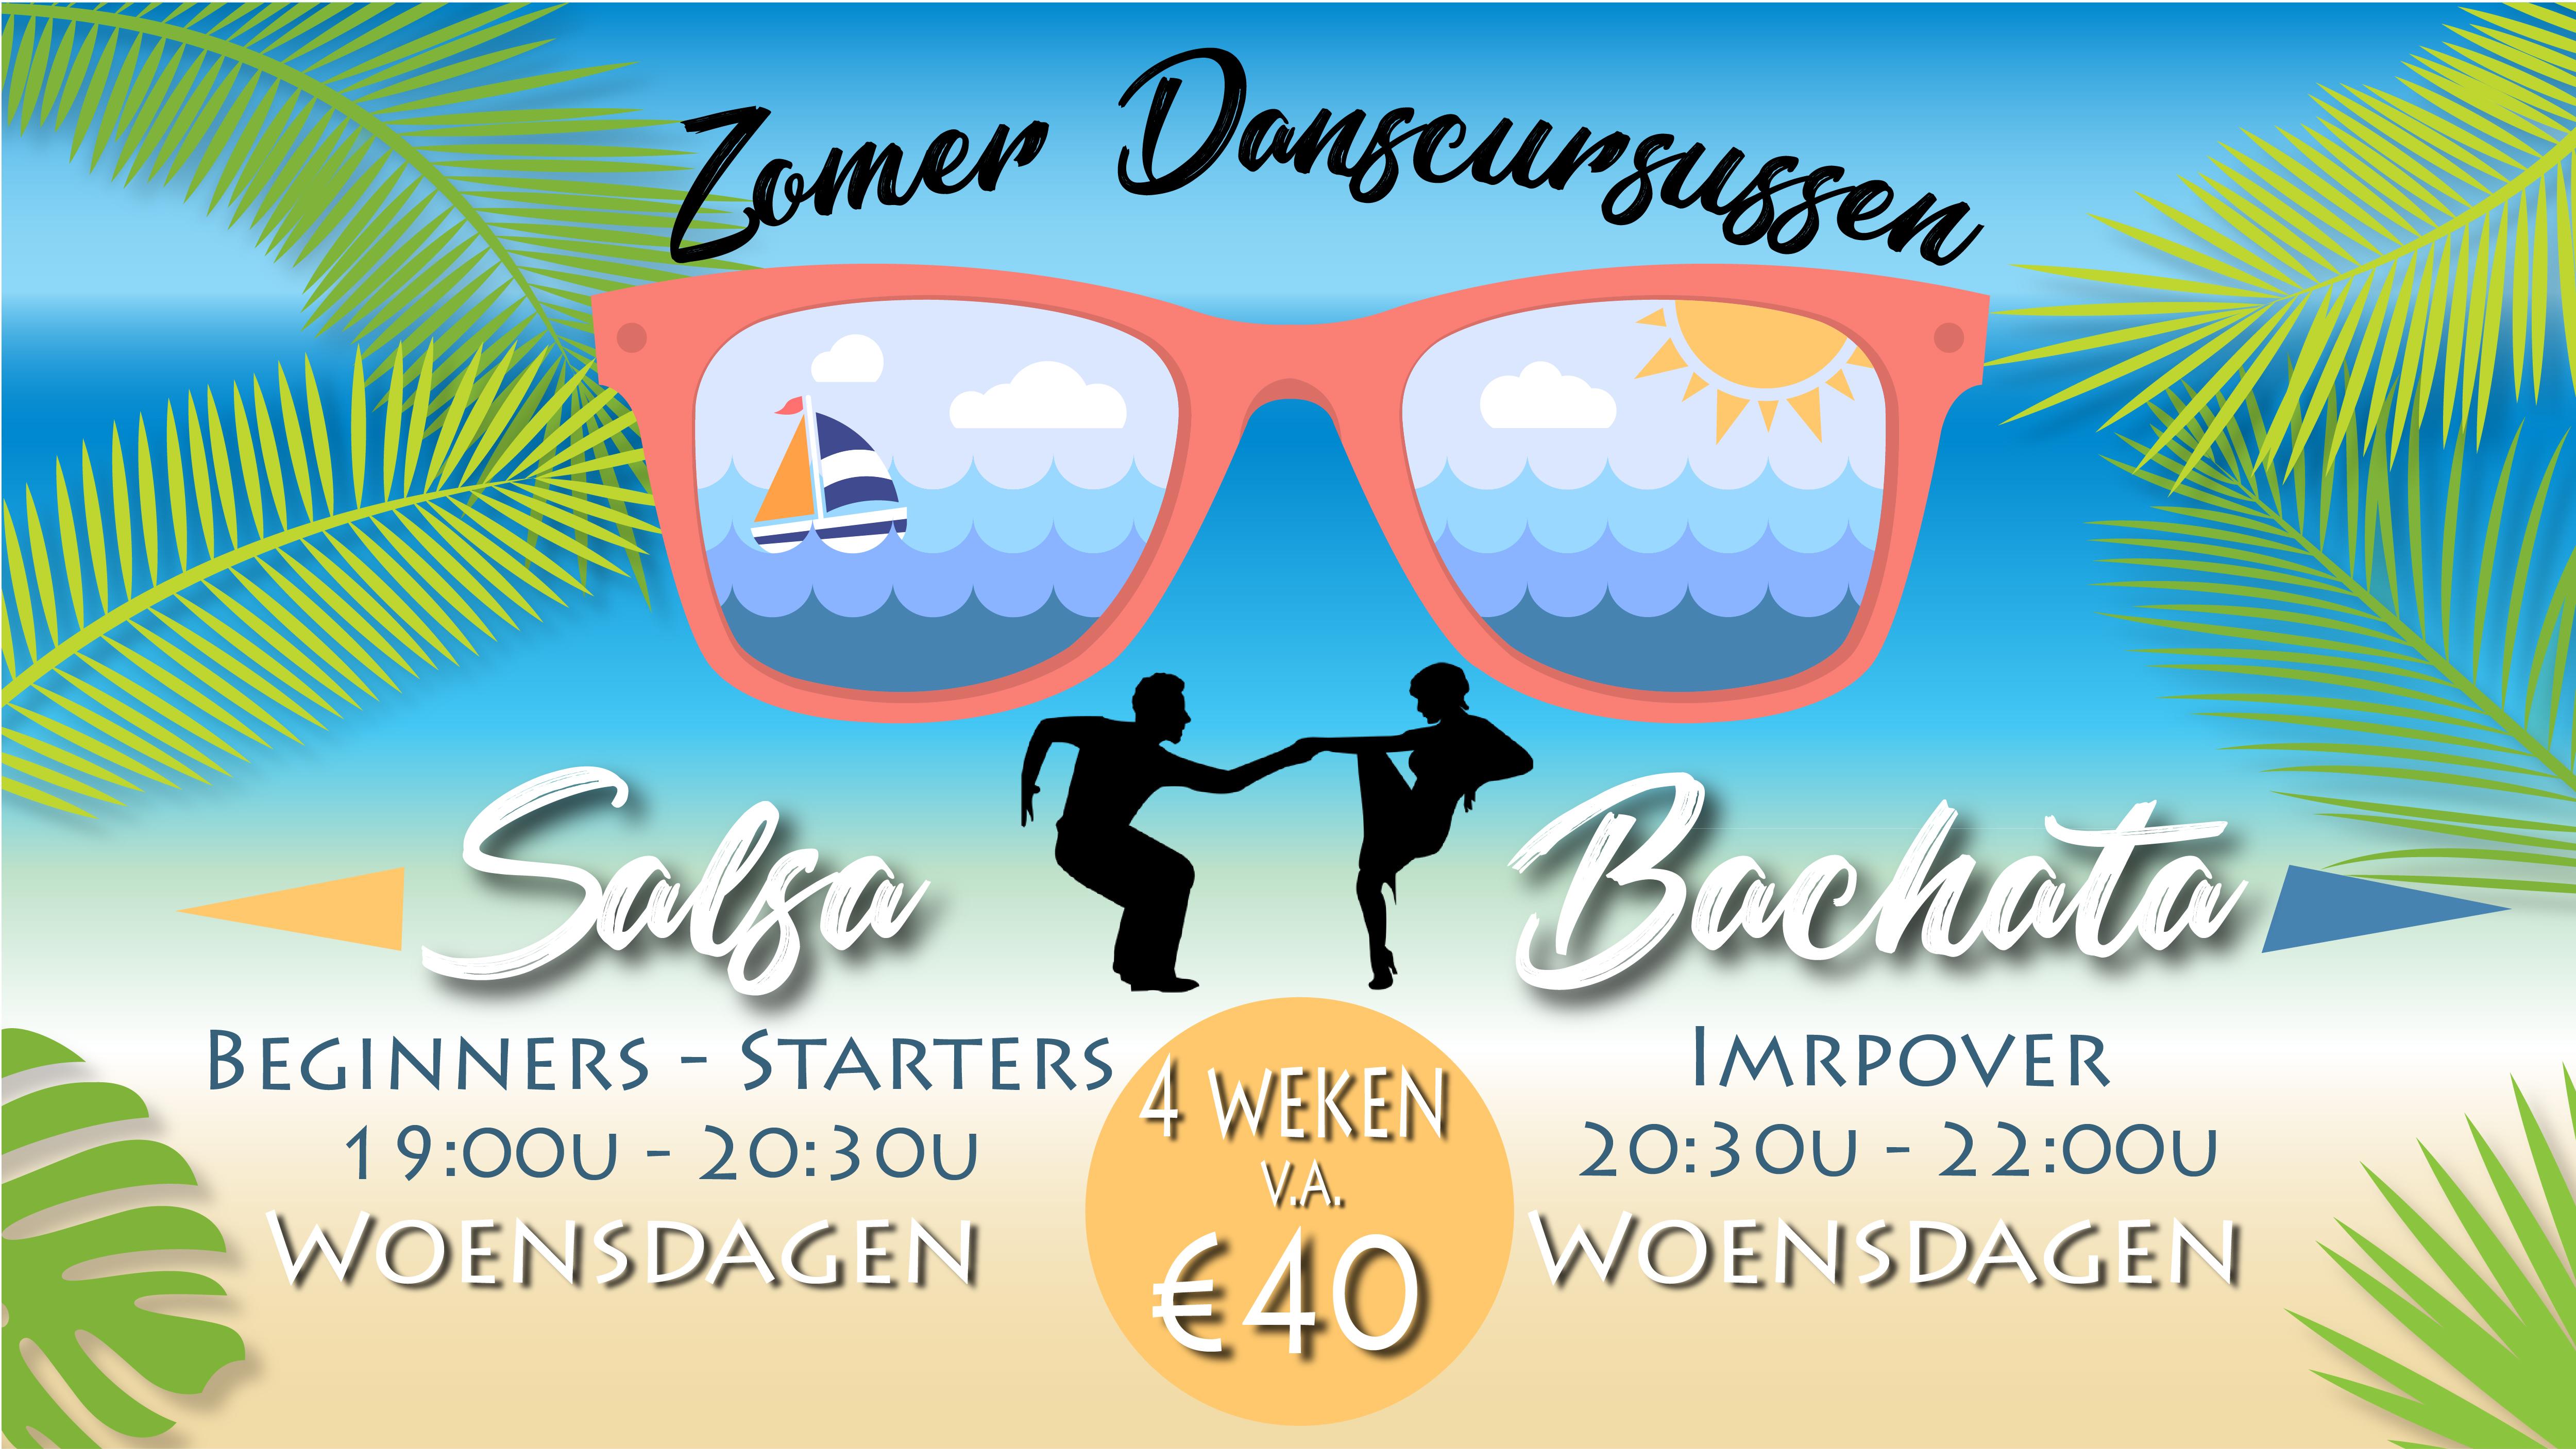 Salsa & Bachata zomer Cursussen 2019 in Enschede